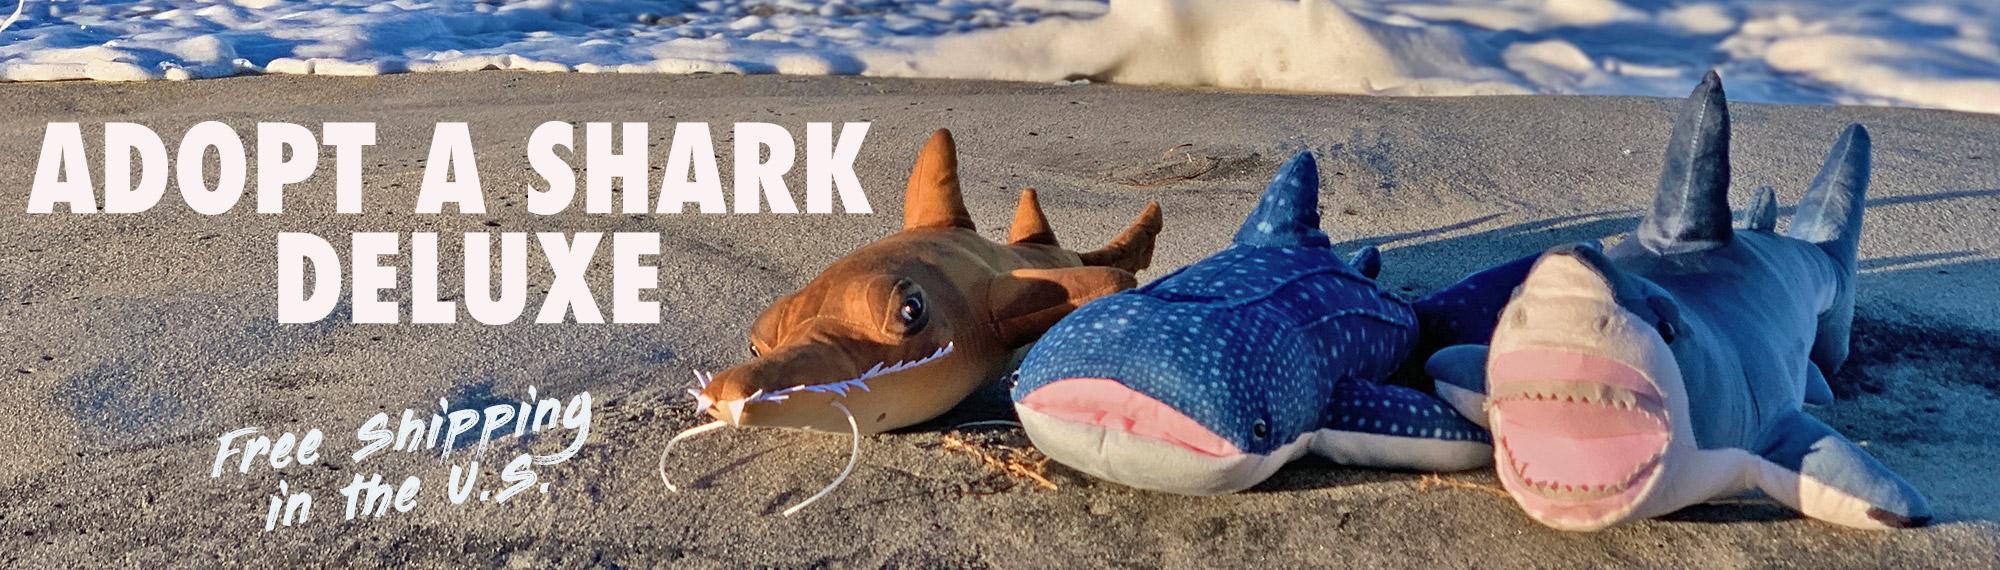 category-banner-shark-adoptions-deluxe-beach.jpg